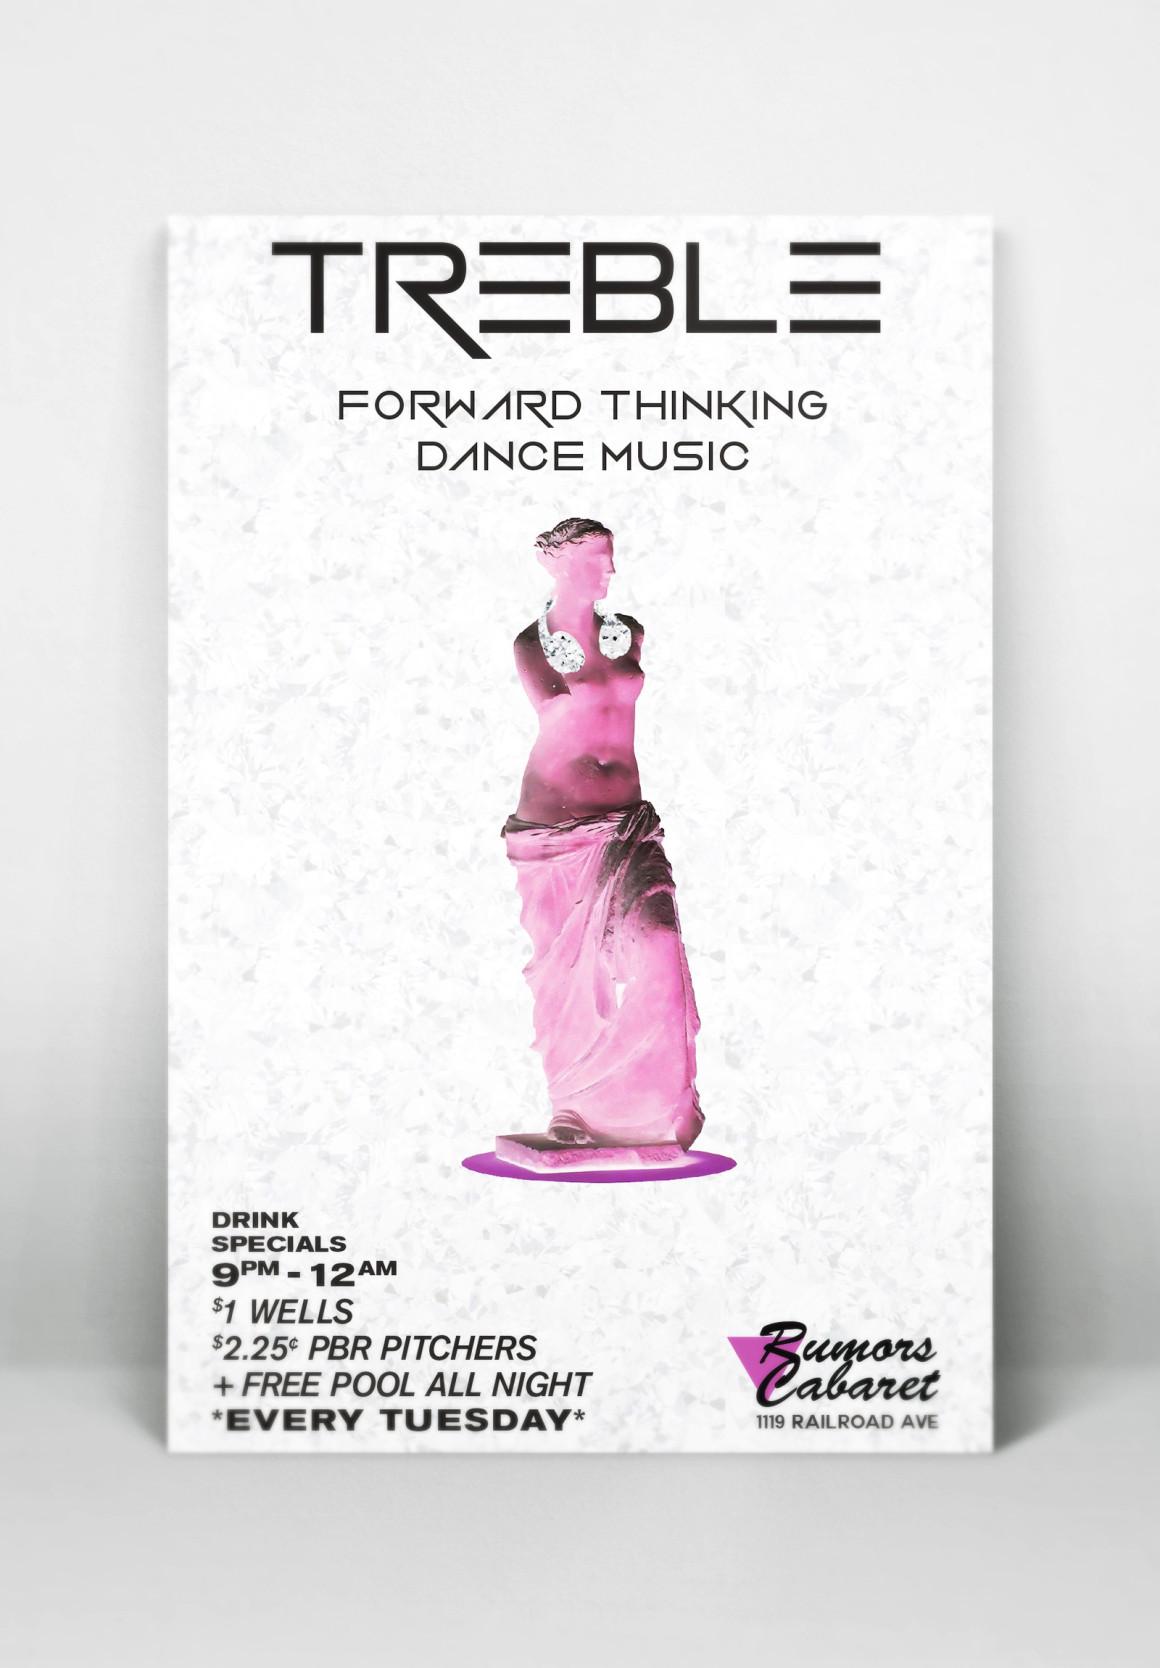 treble1